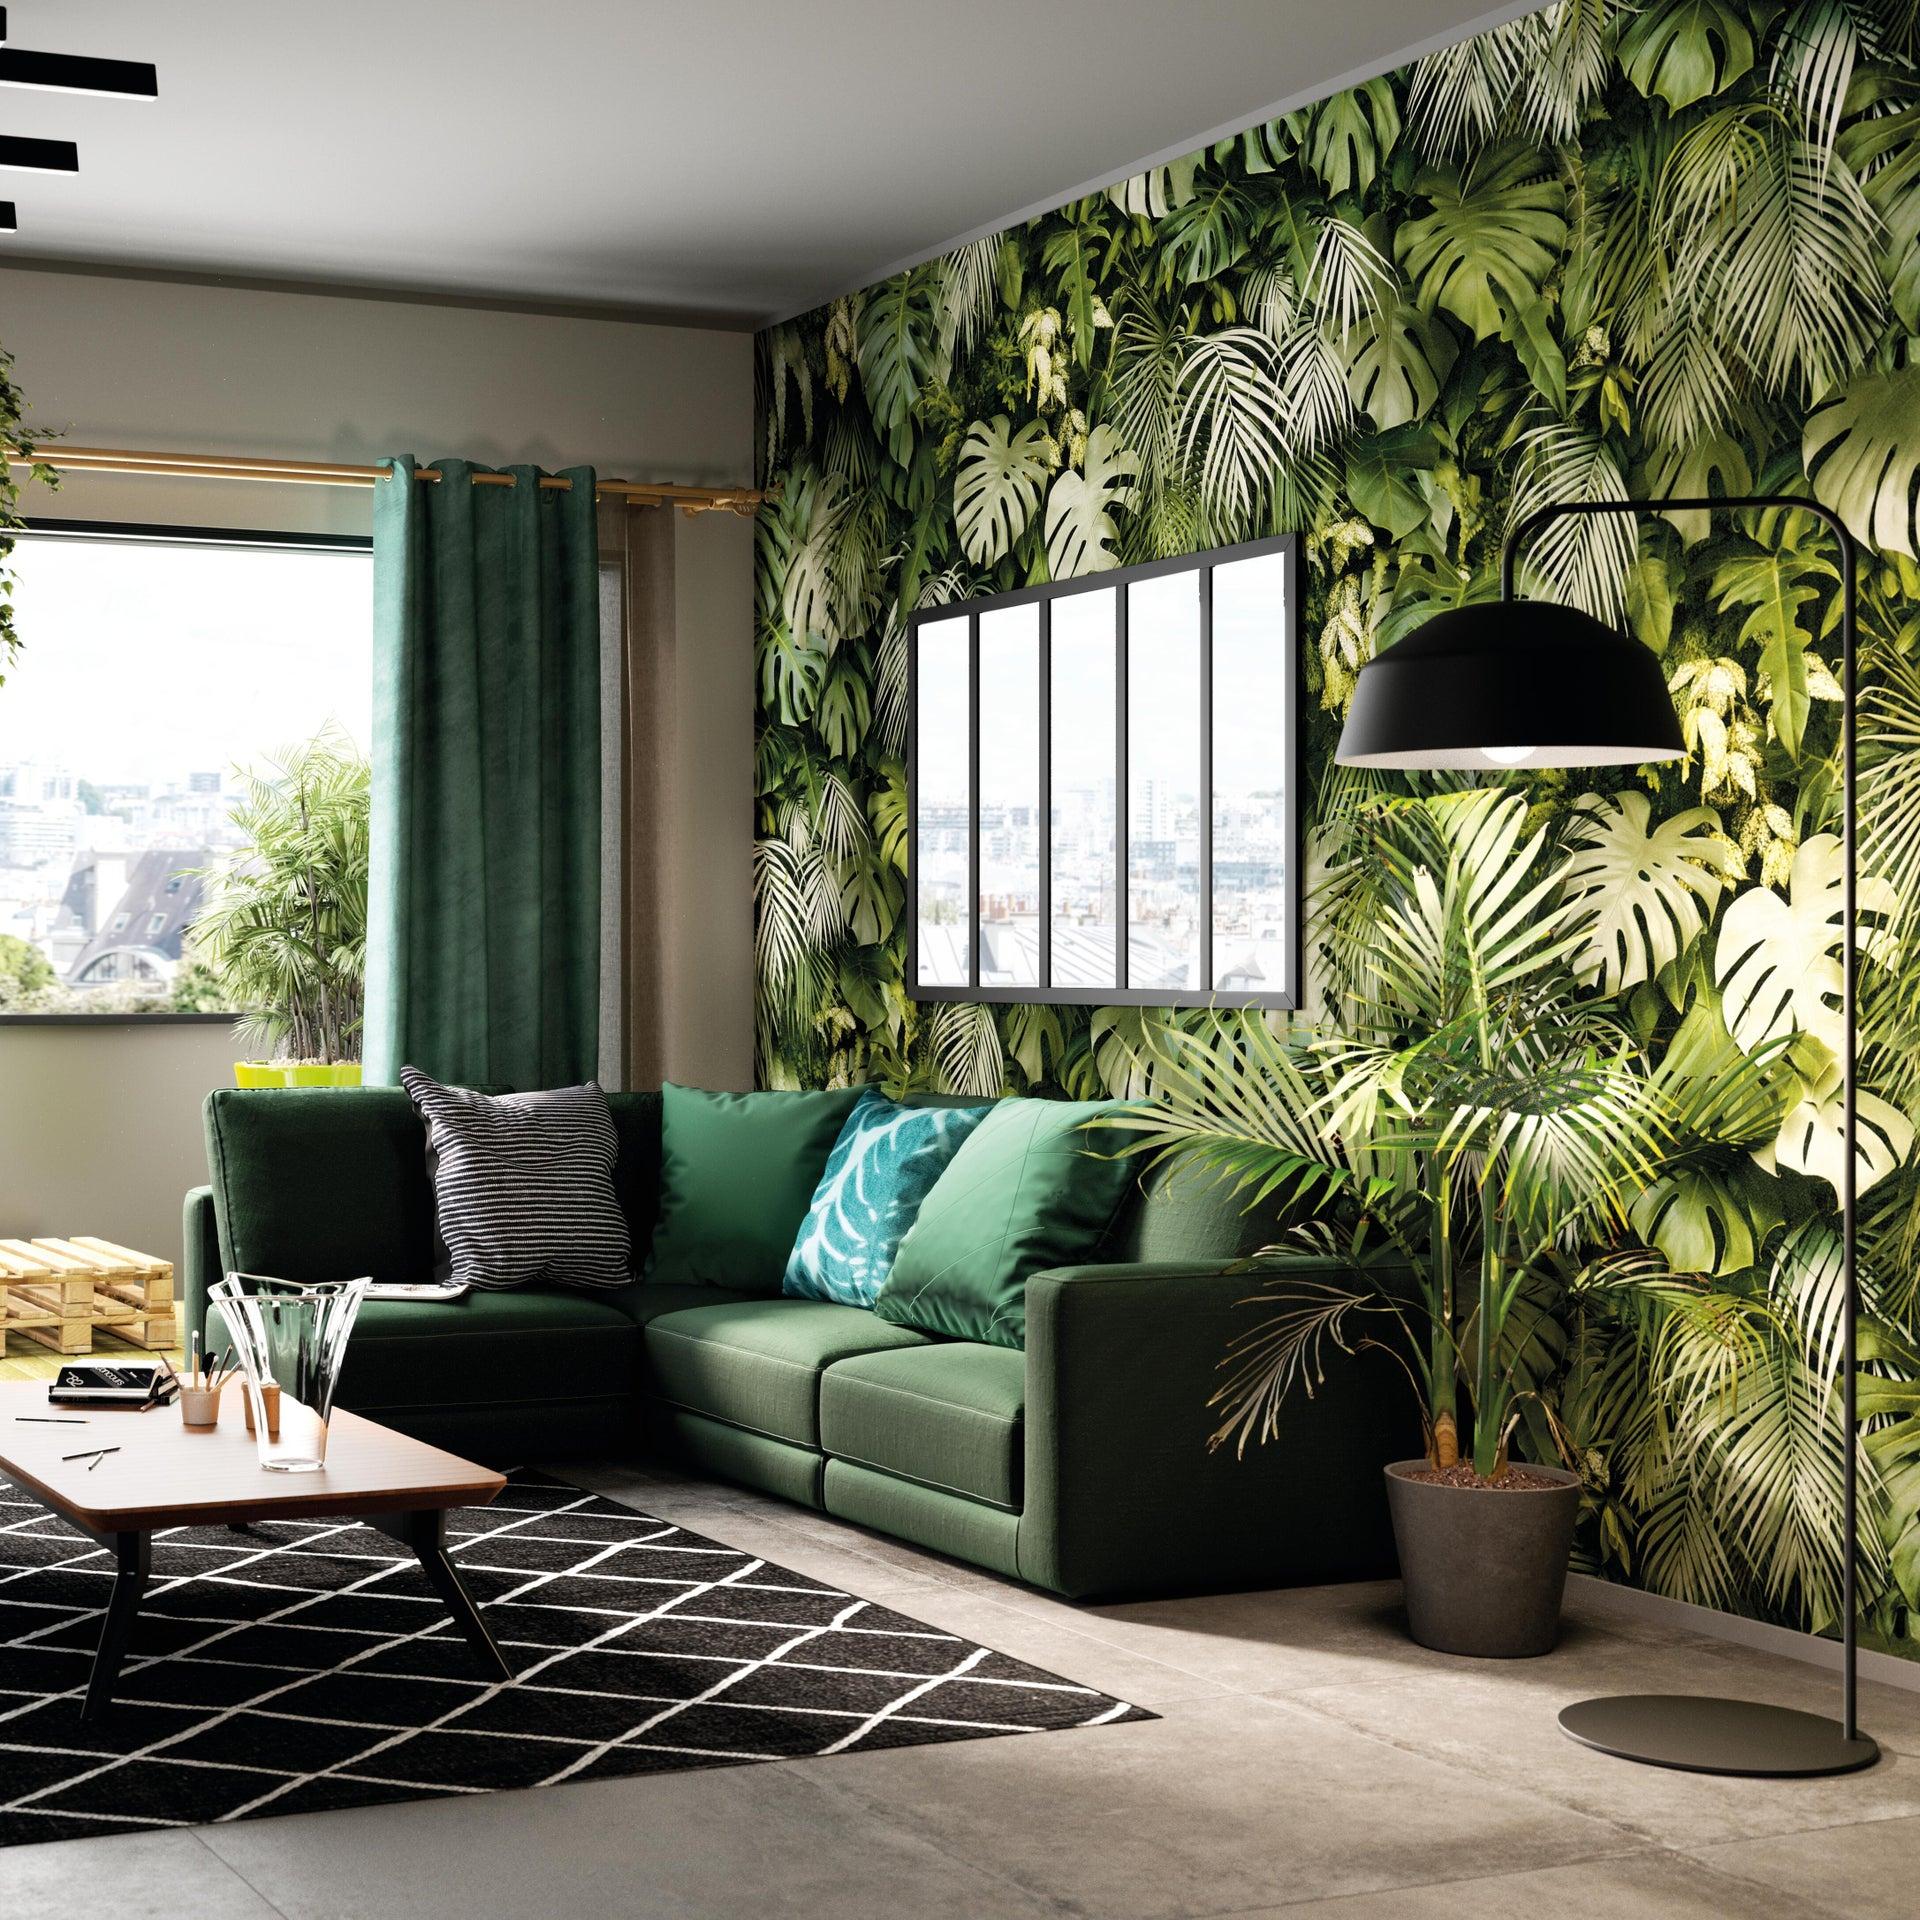 Tenda INSPIRE New Manchester verde occhielli 140 x 280 cm - 6